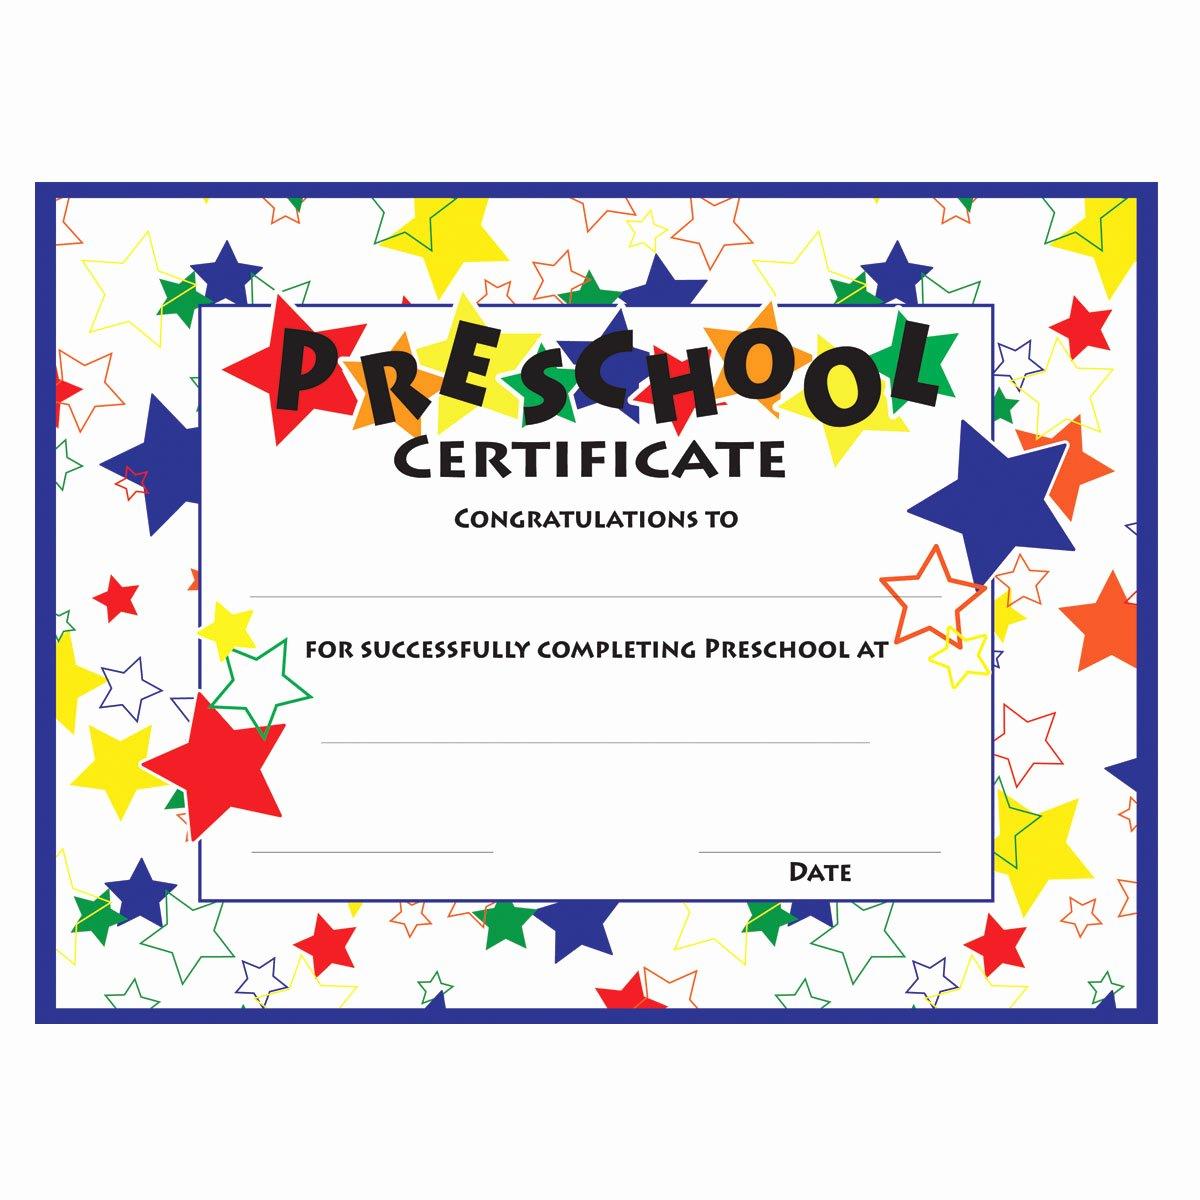 Preschool Graduation Certificate Template Free Fresh 11 Preschool Certificate Templates Pdf